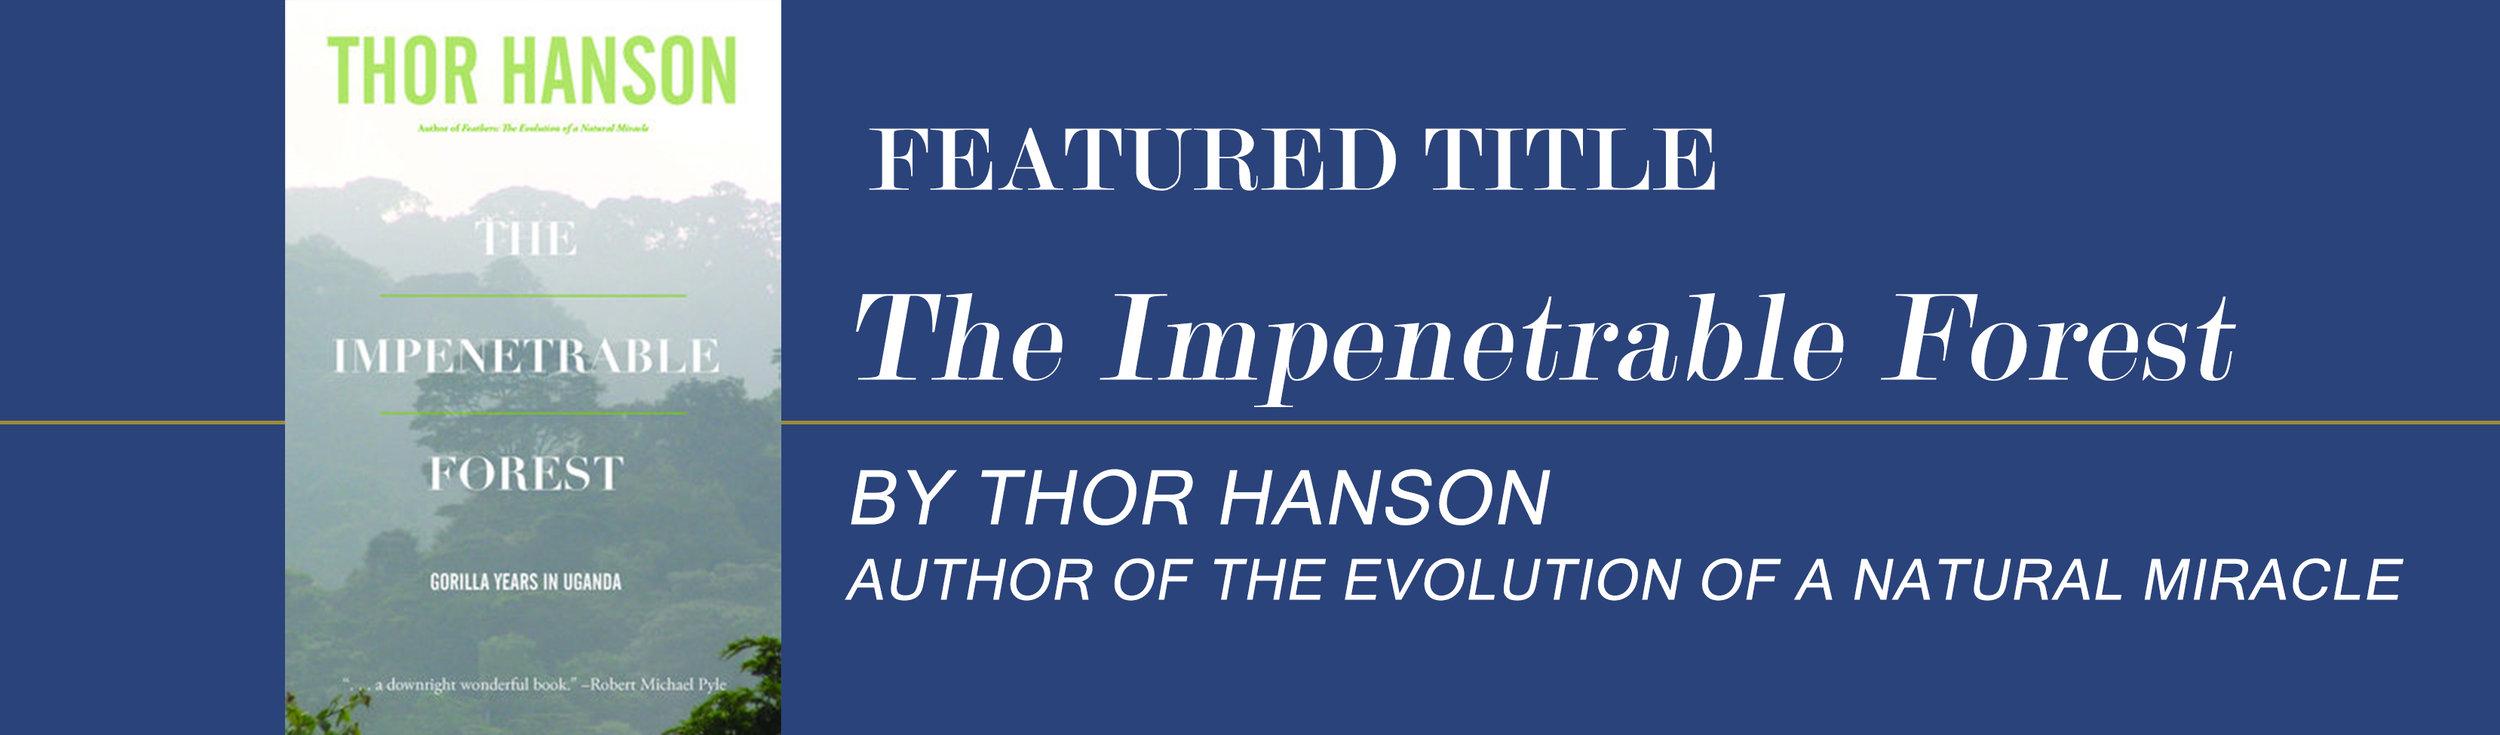 Thor Hanson Featured Book Template.jpg